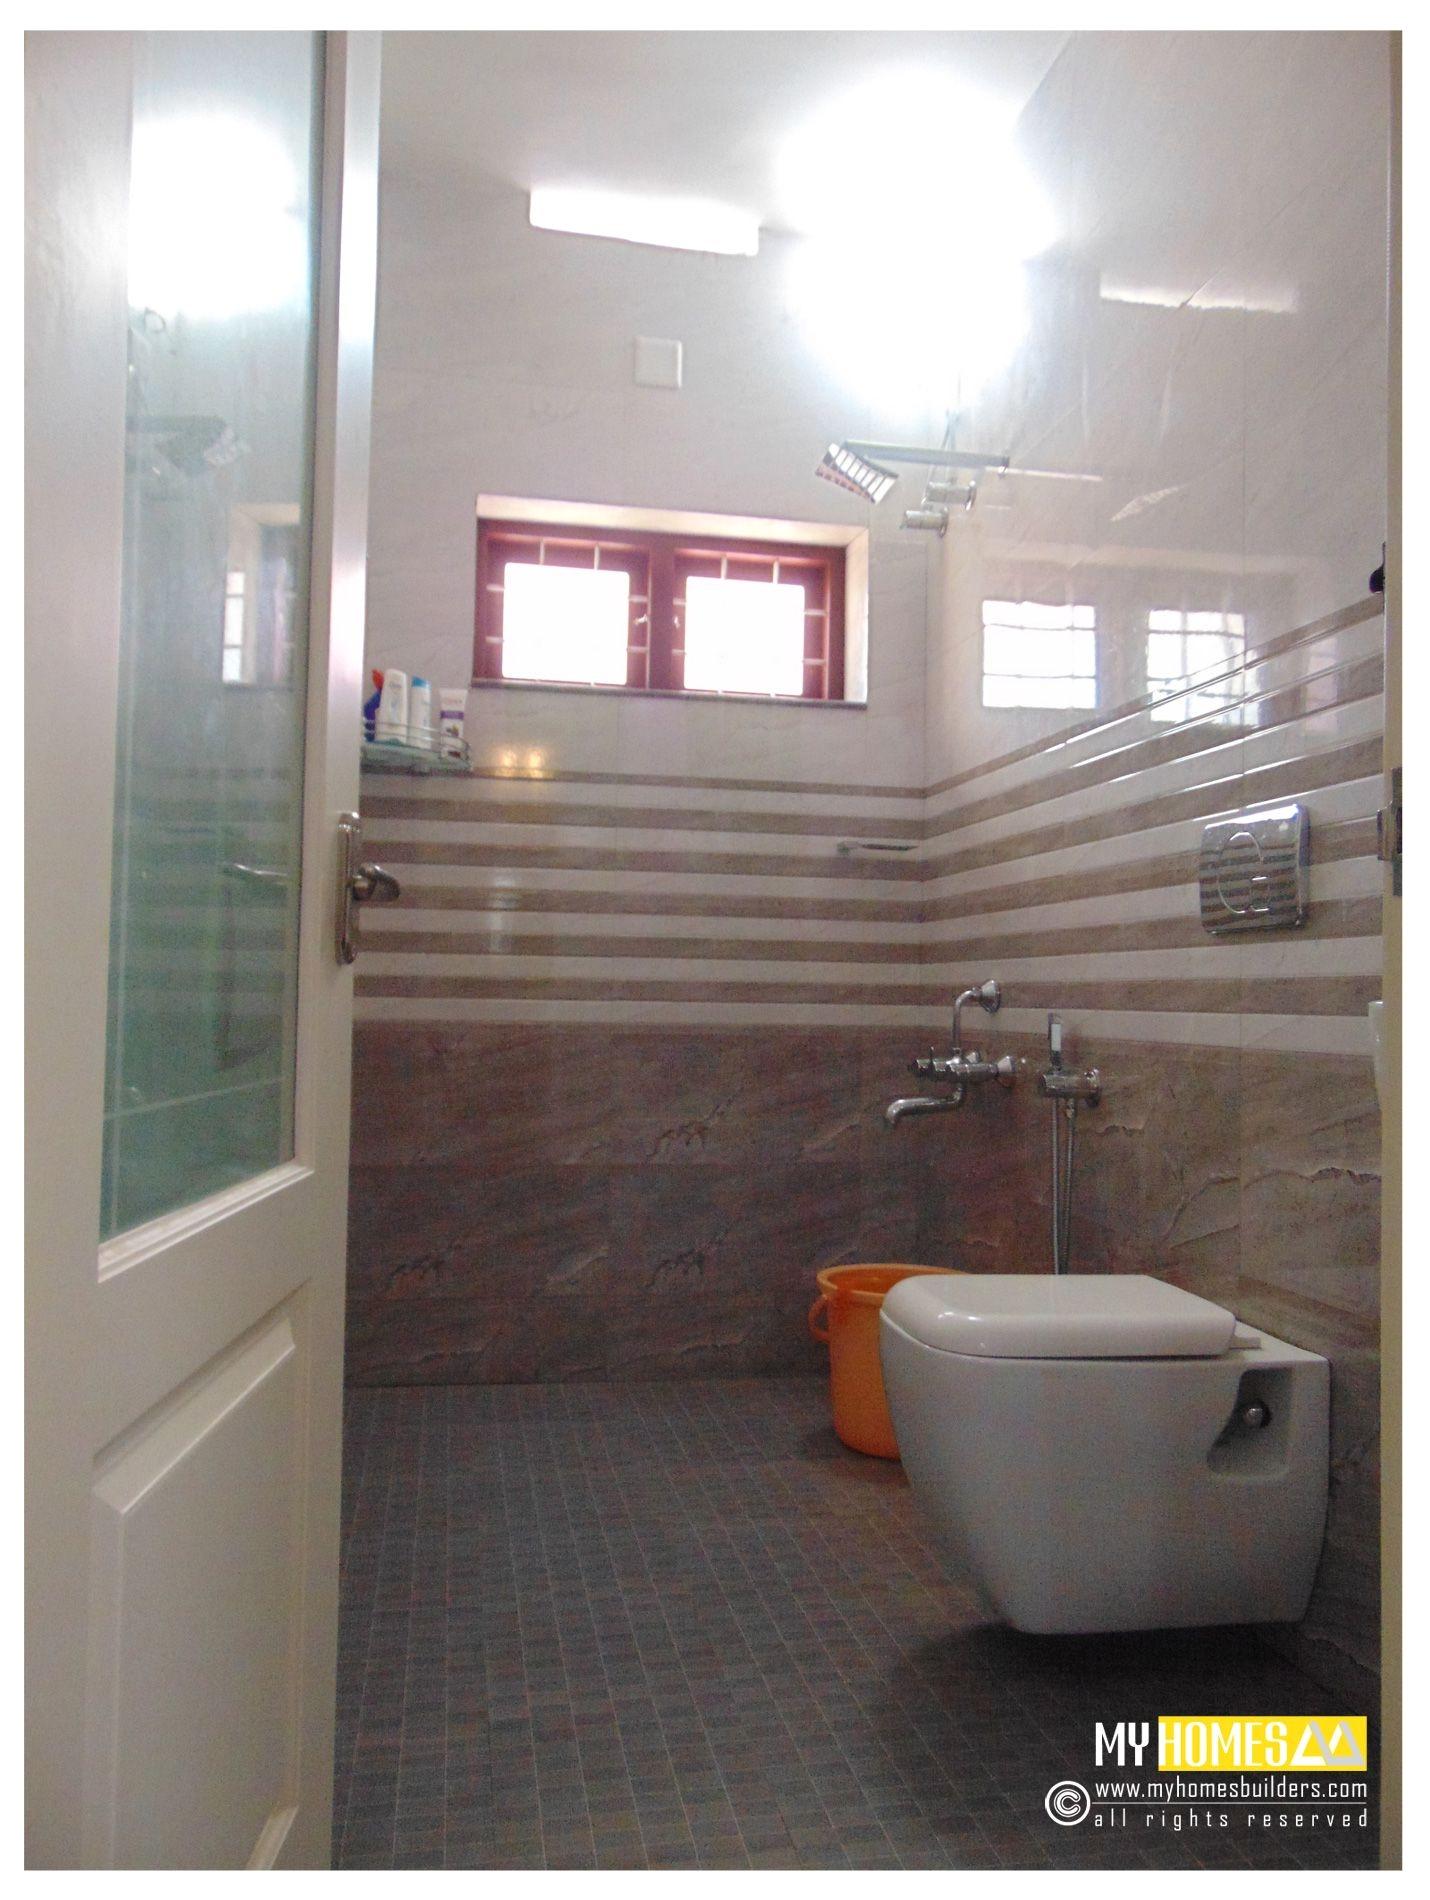 See Through Bathtub See Through Bathtub Lovely Kerala Homes Bathroom Designs top